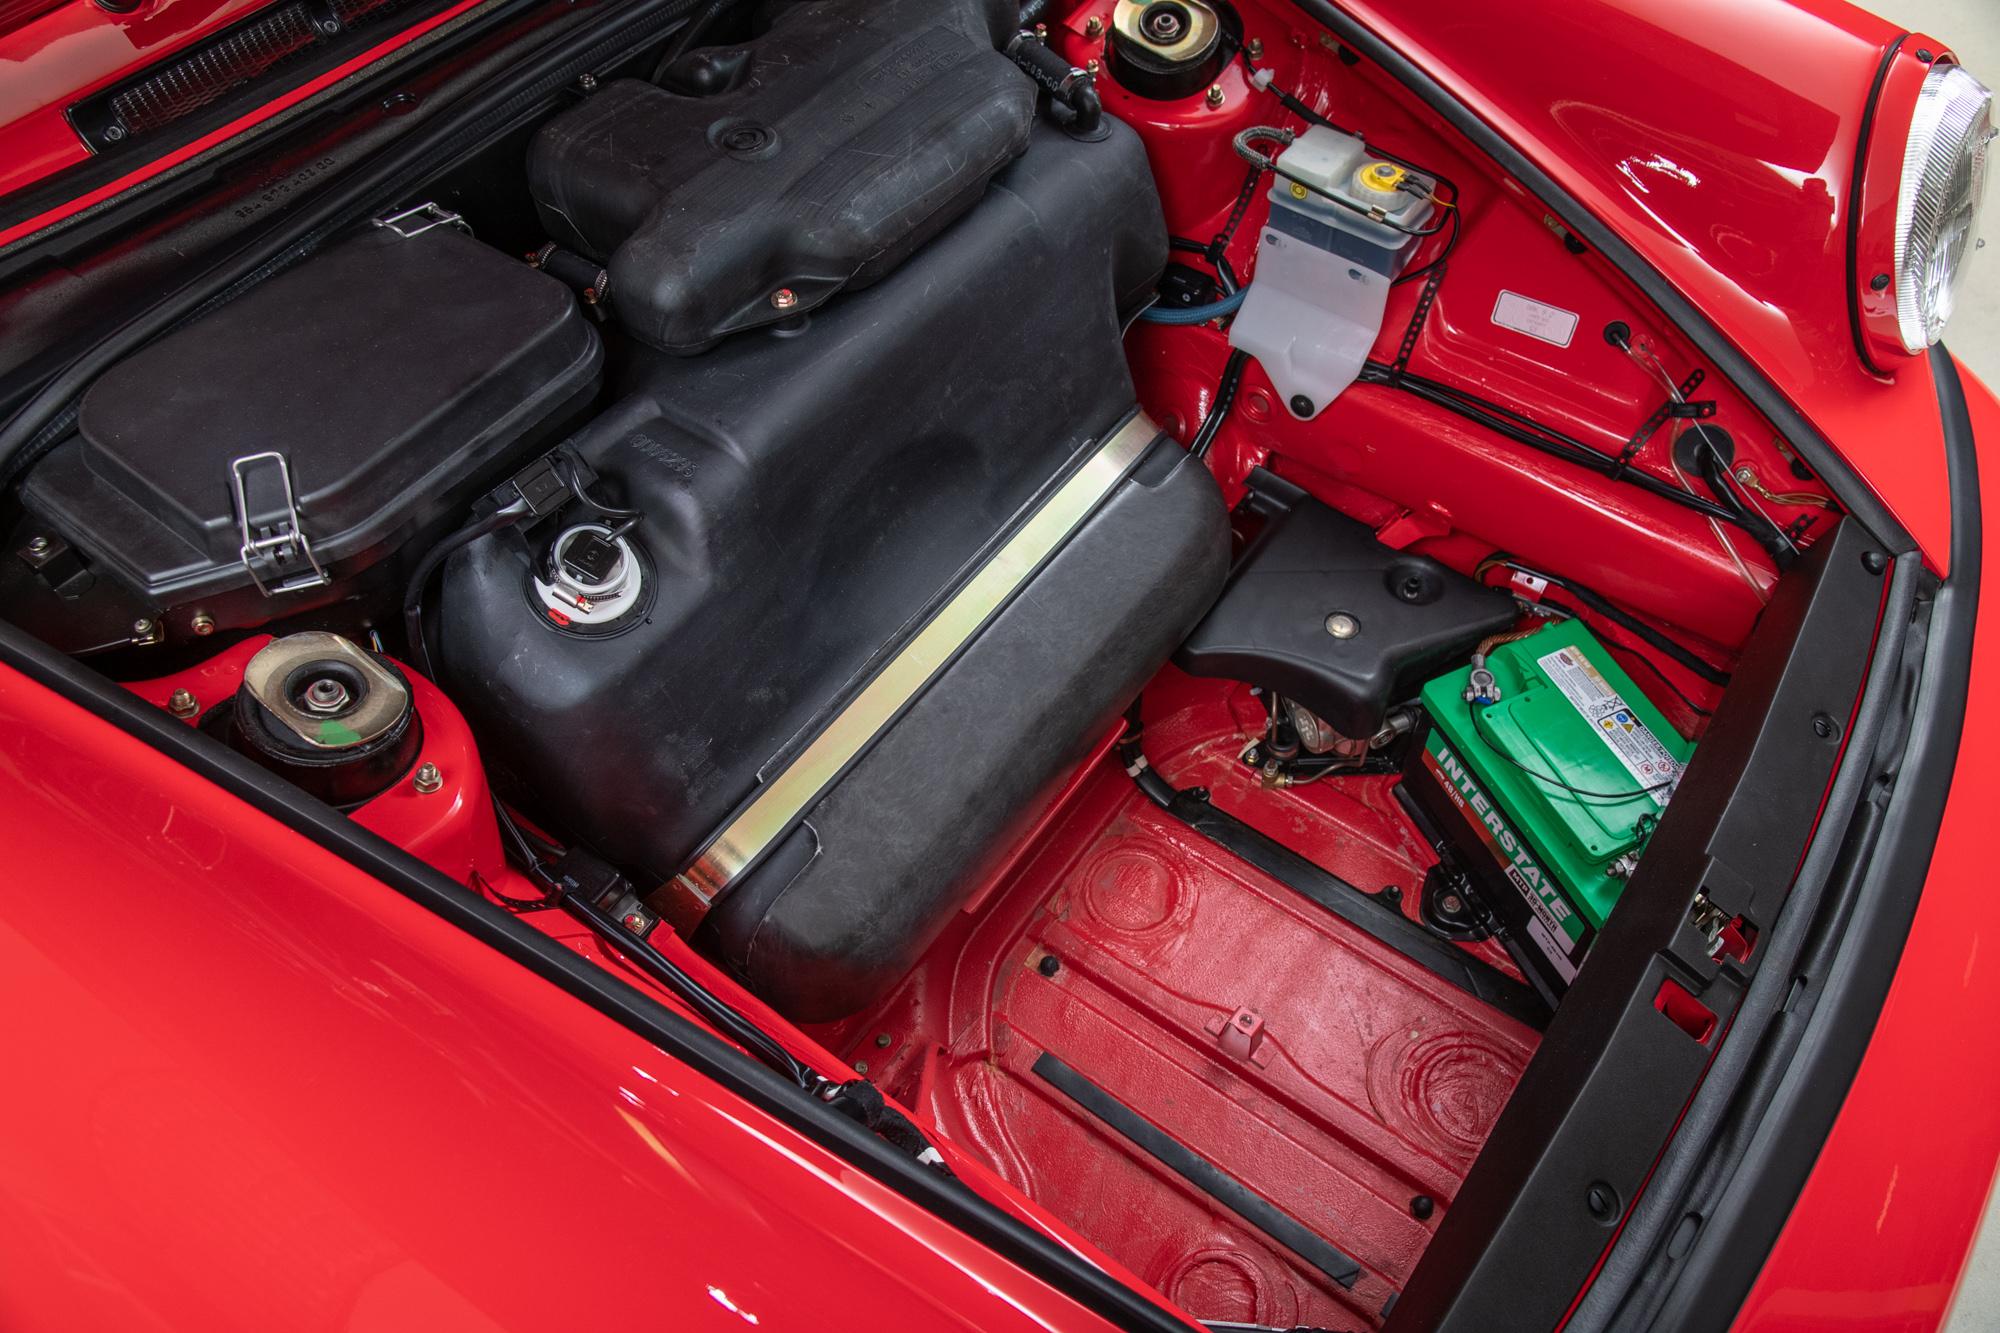 1993 Porsche 911 RS America, RED, VIN WP0AB2965PS419235, MILEAGE 19989